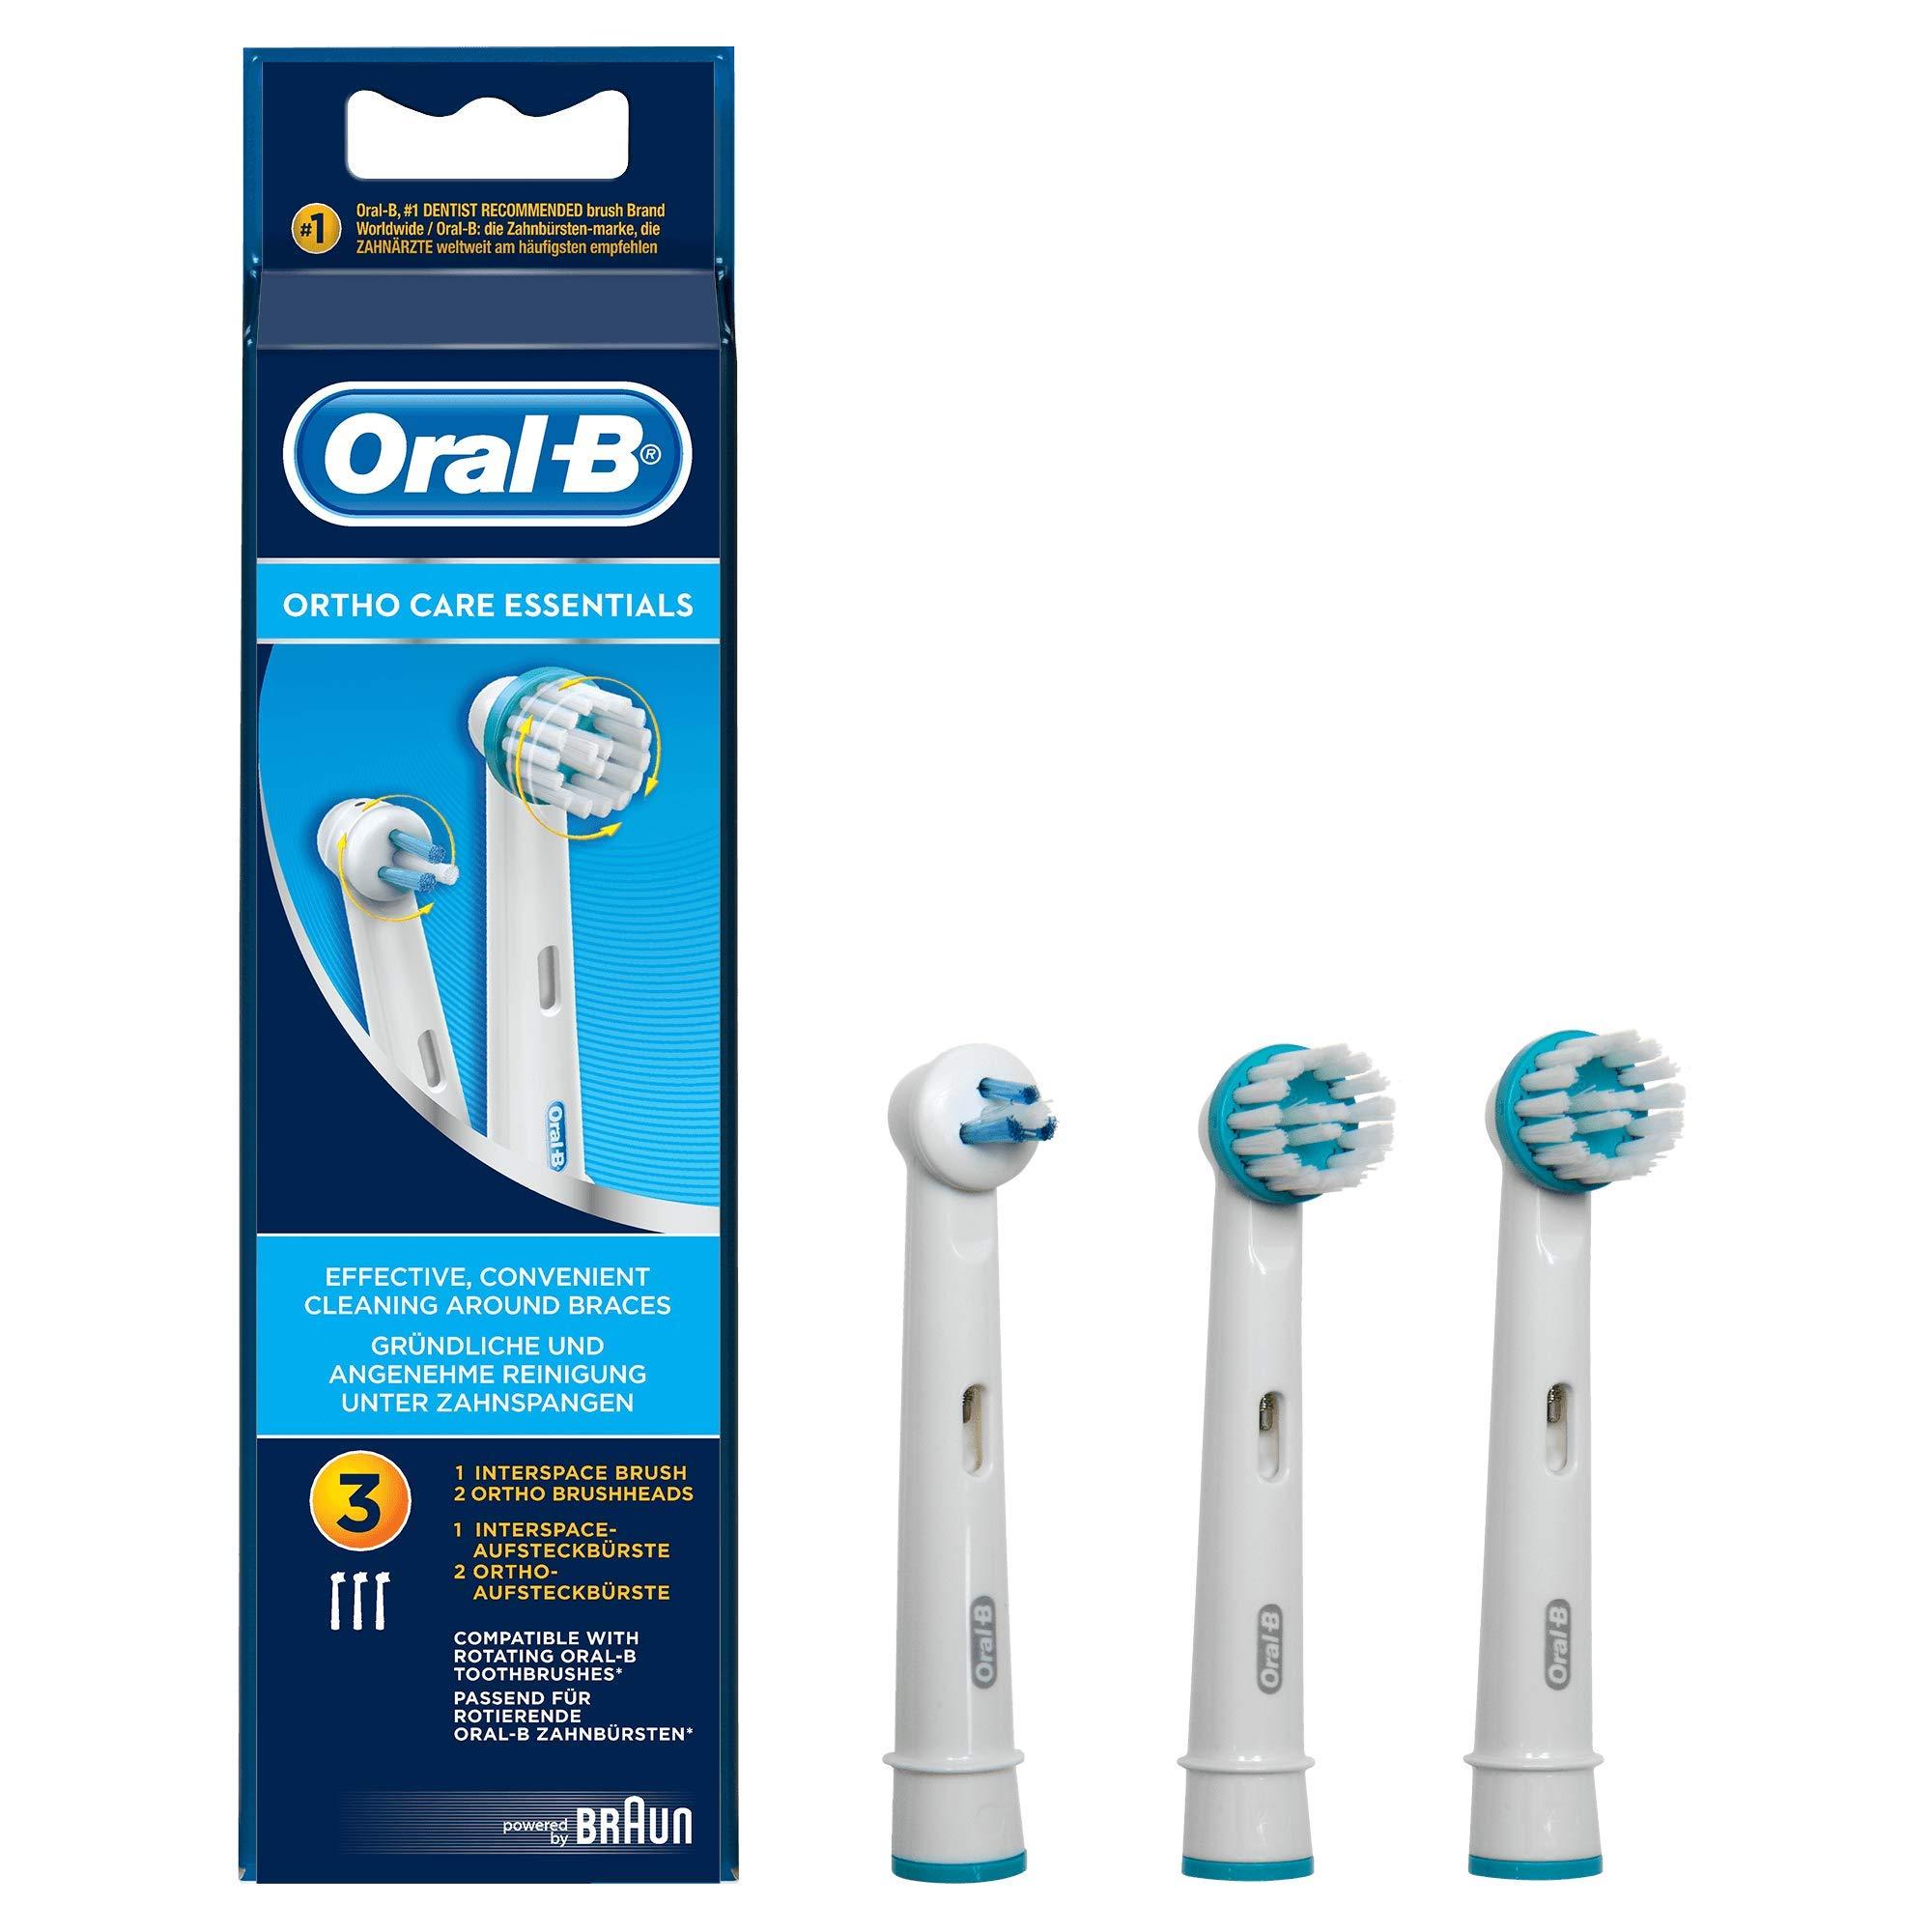 Oral-B Ortho Care Cabezales de Recambio, 3 Unidades product image